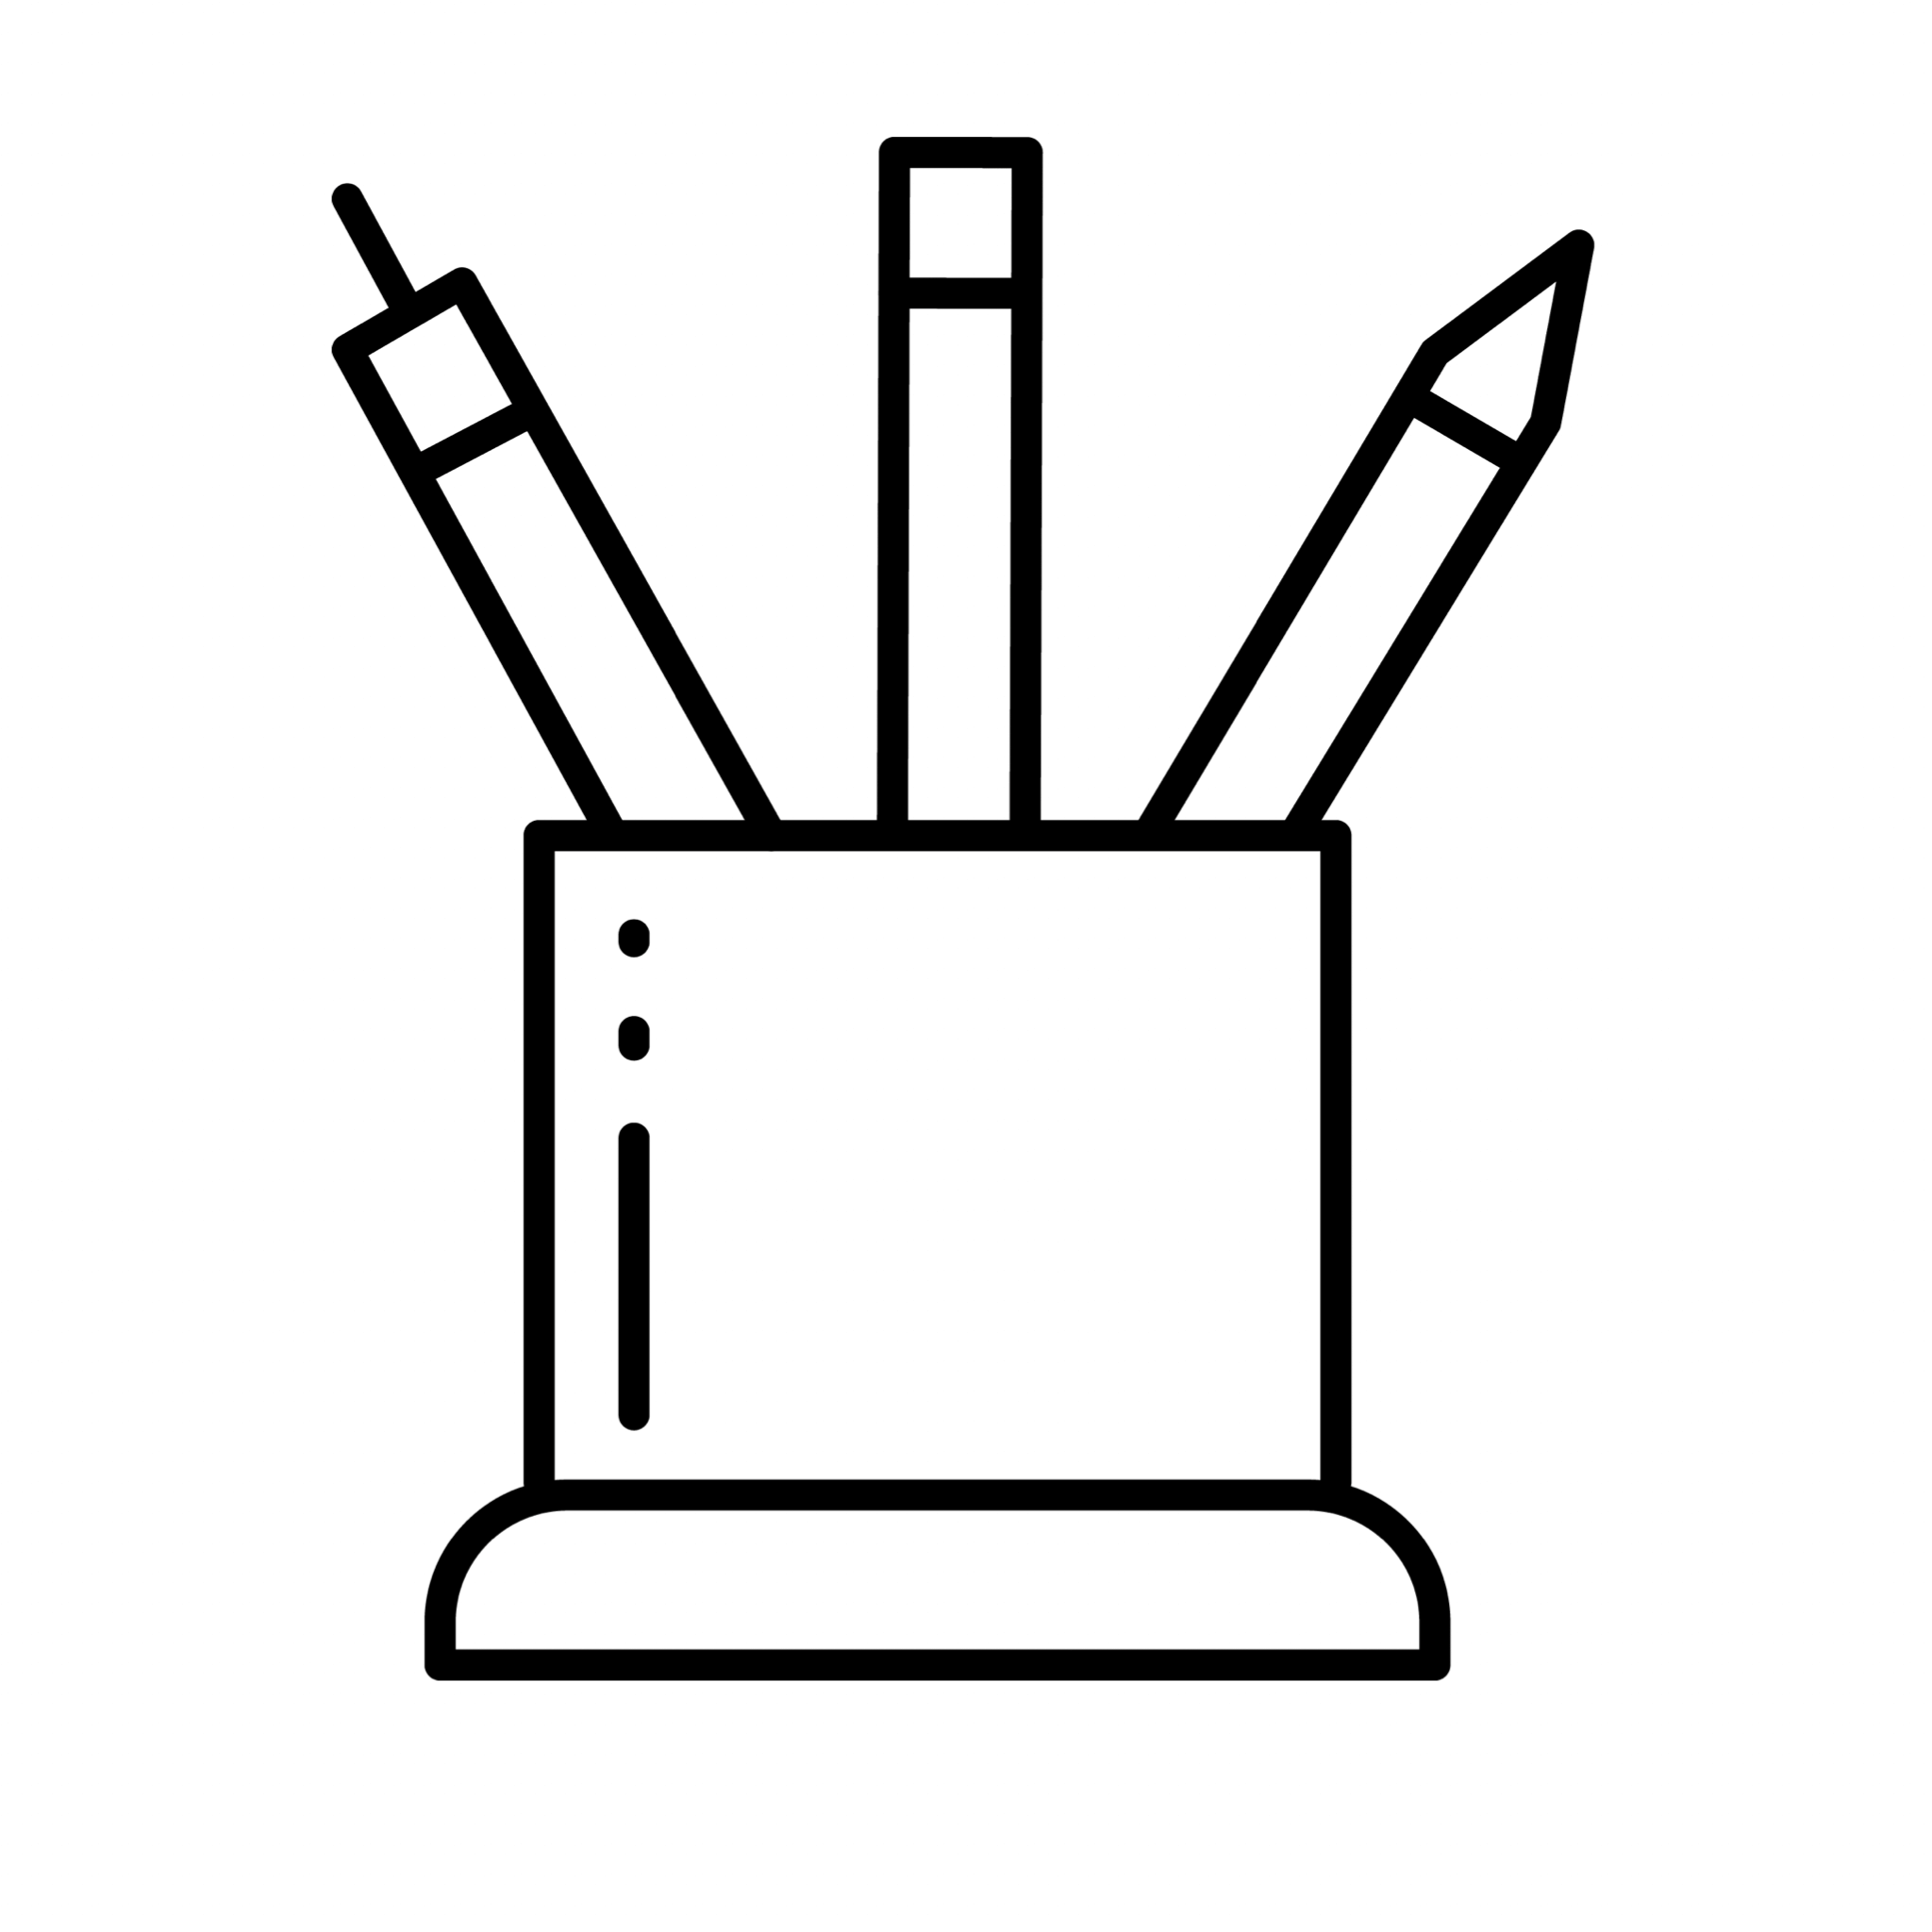 STEP 3: Design Time